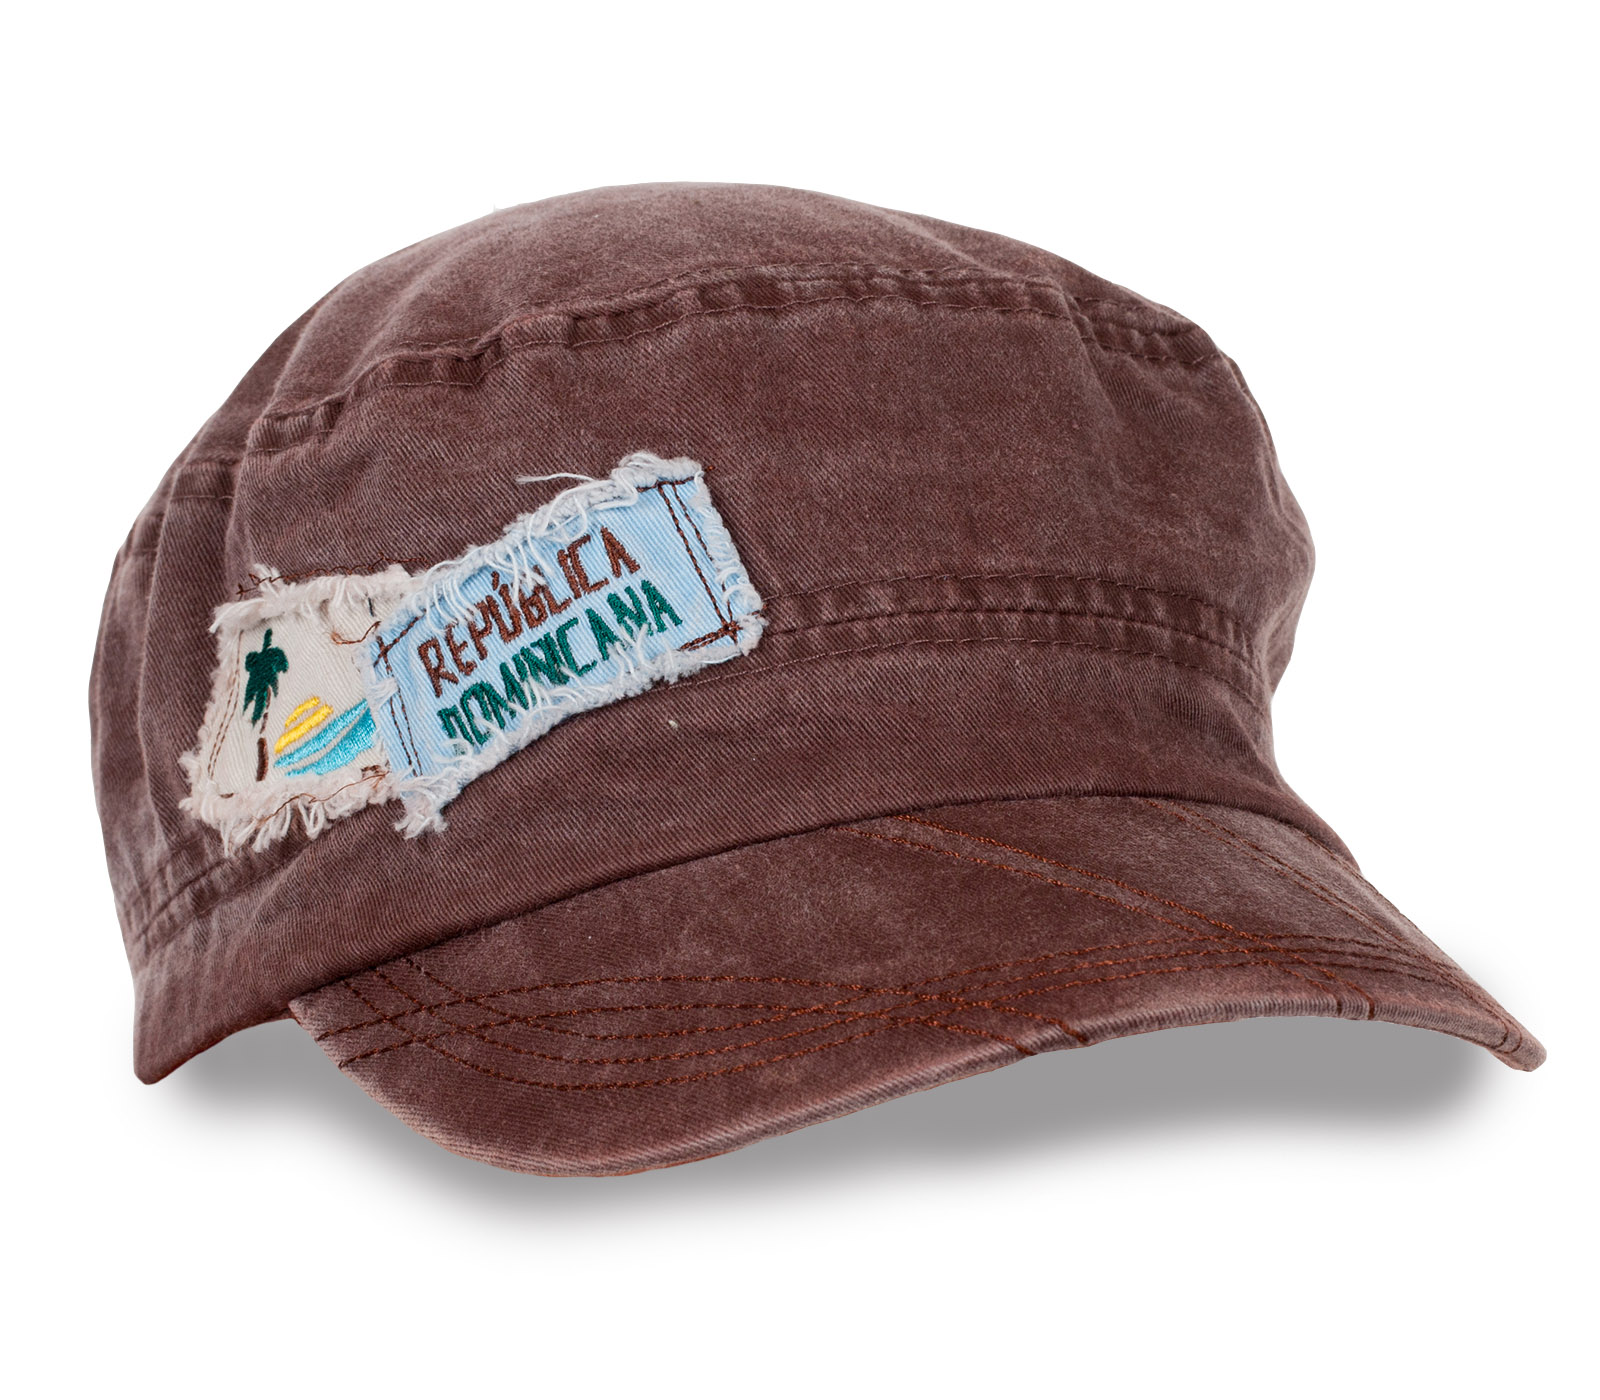 Классная кепка Republica Dominicana.